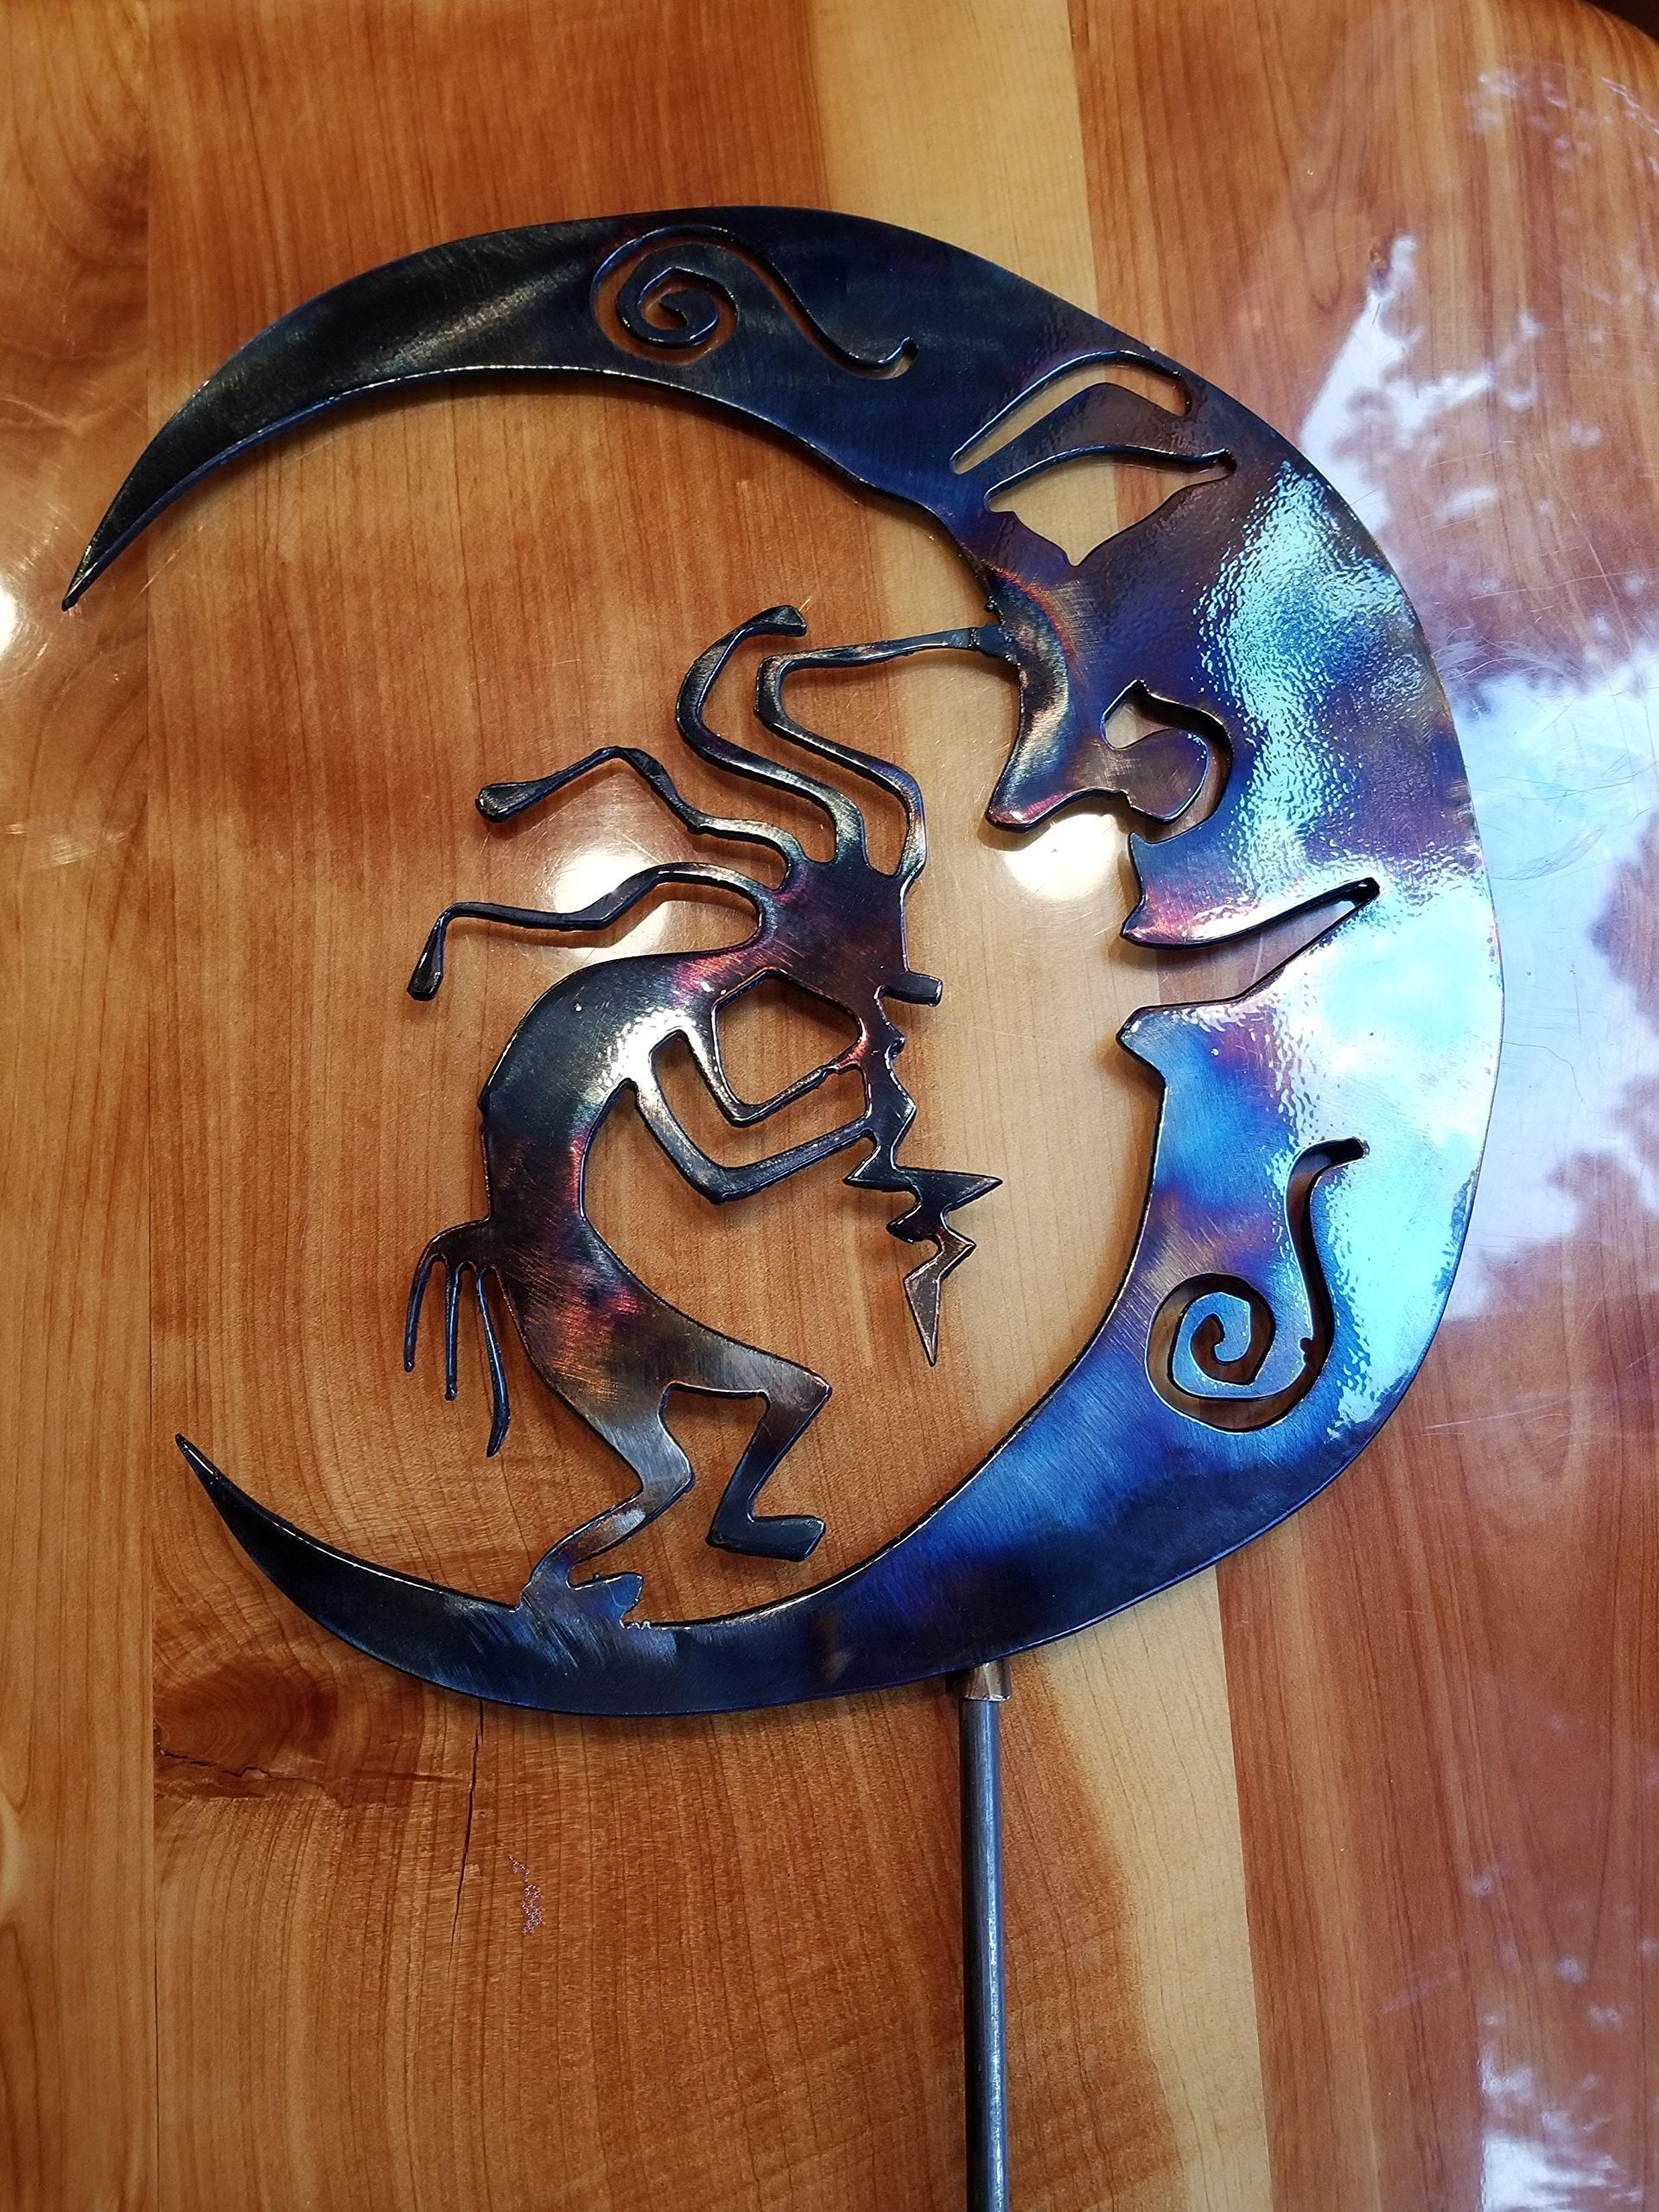 Kokopelli Moon/9w x 10 1/8h/quality metal art/14 ga steel